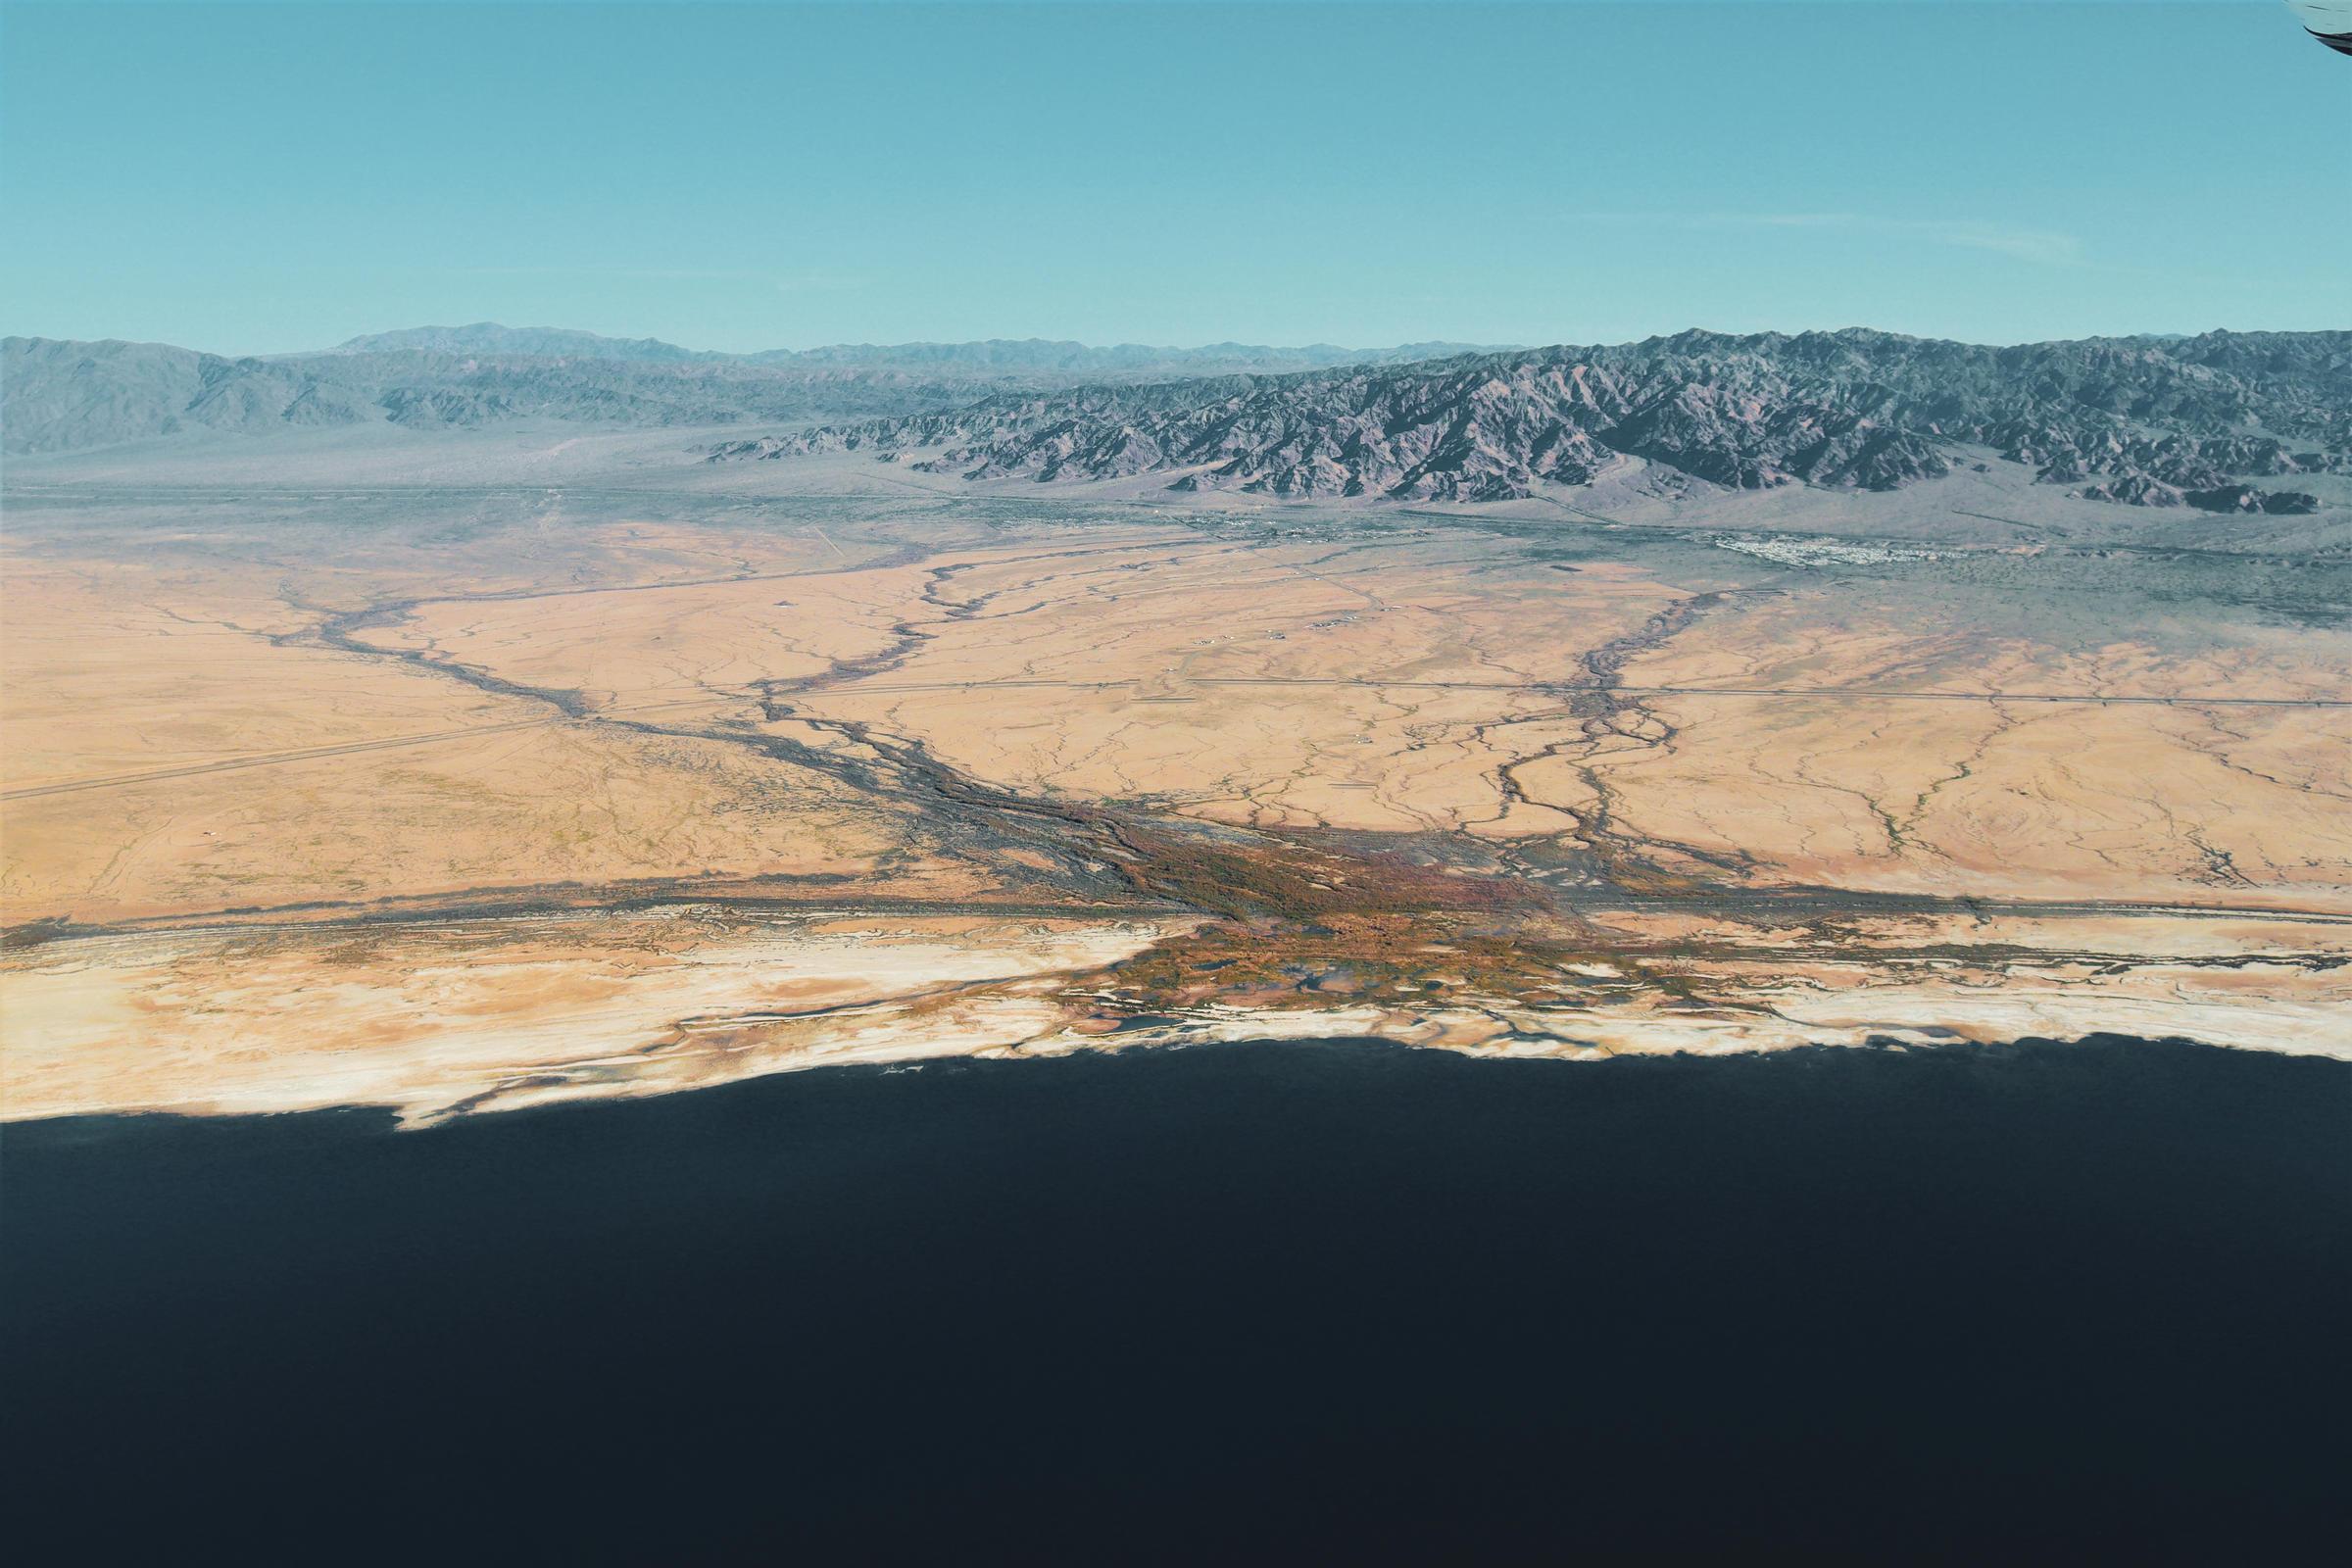 Wetlands at the Salton Sea